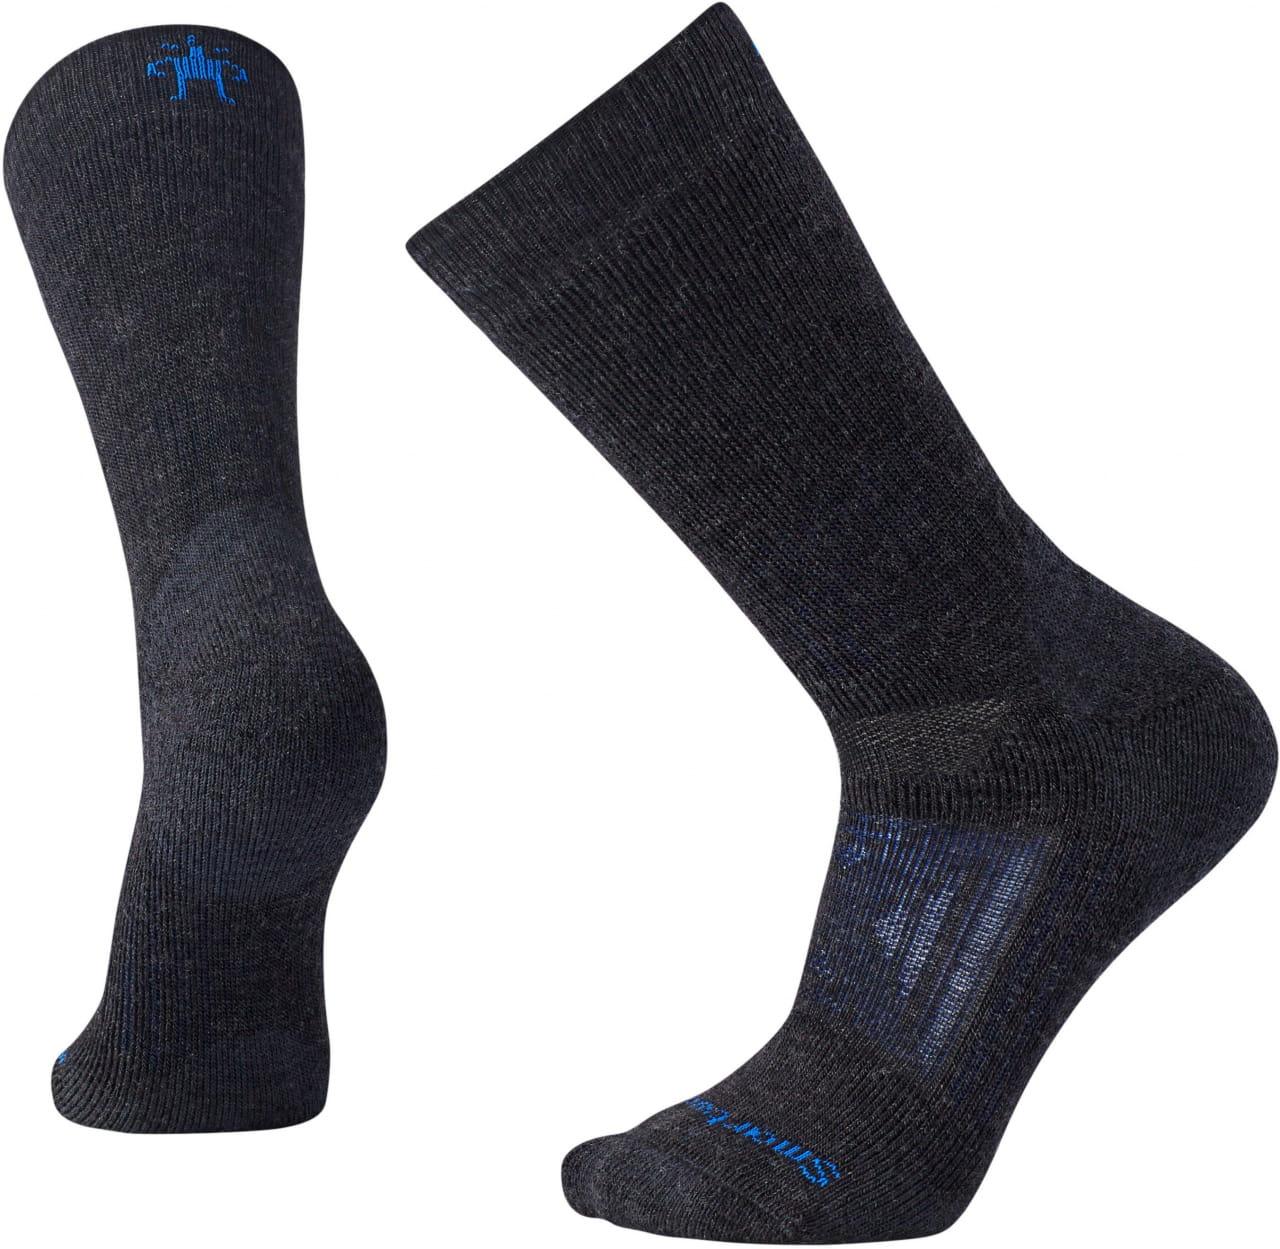 Unisexové ponožky Smartwool Mntner Extr Cshn Crew Socks